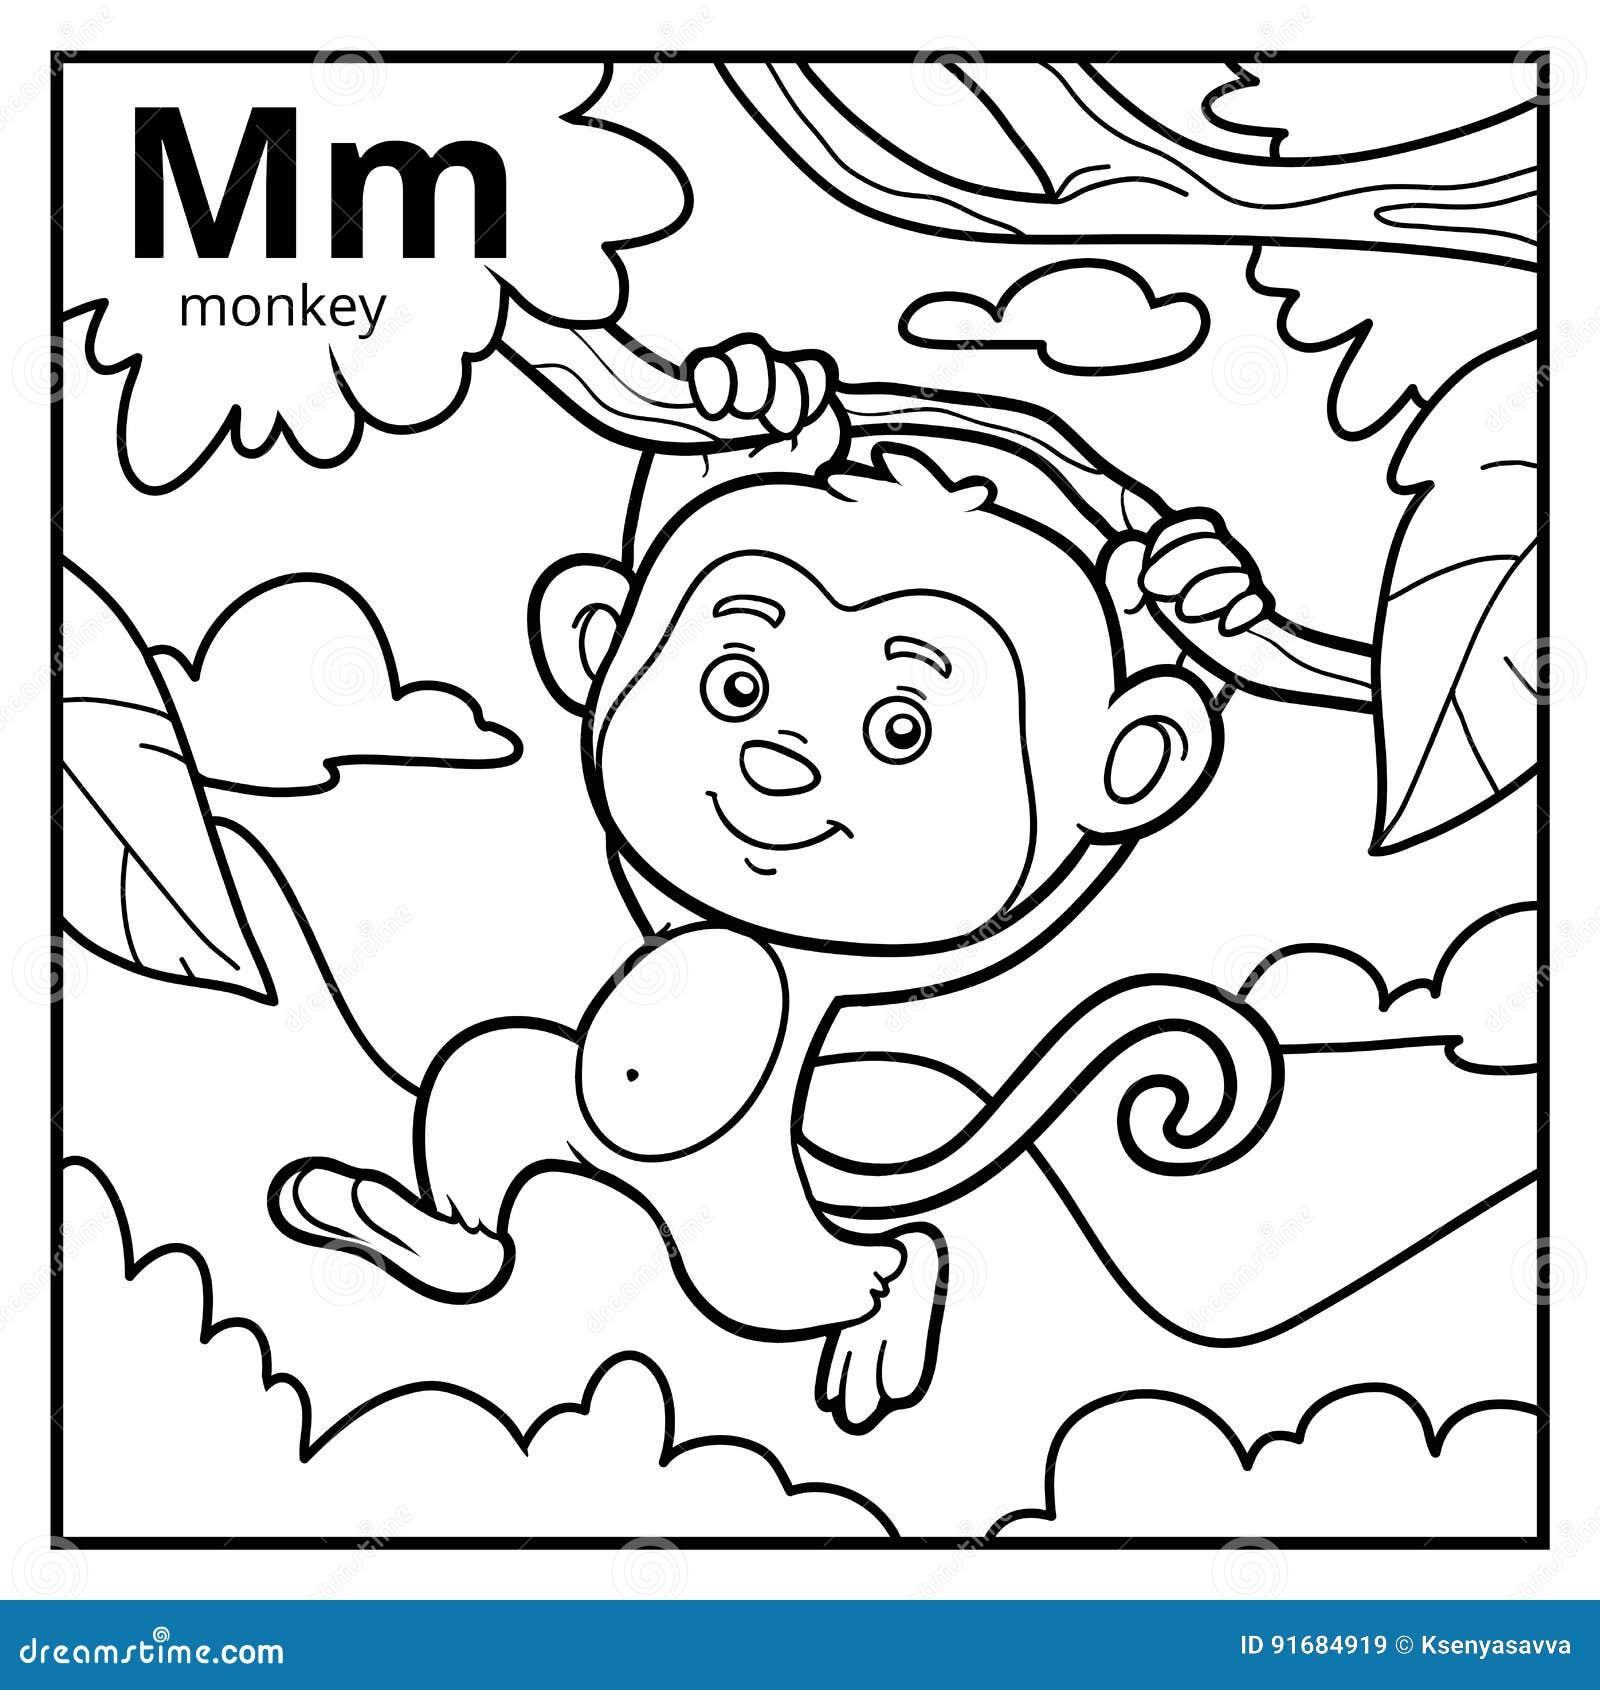 Libro De Colorear, Alfabeto Descolorido Letra M, Mono Ilustración ...